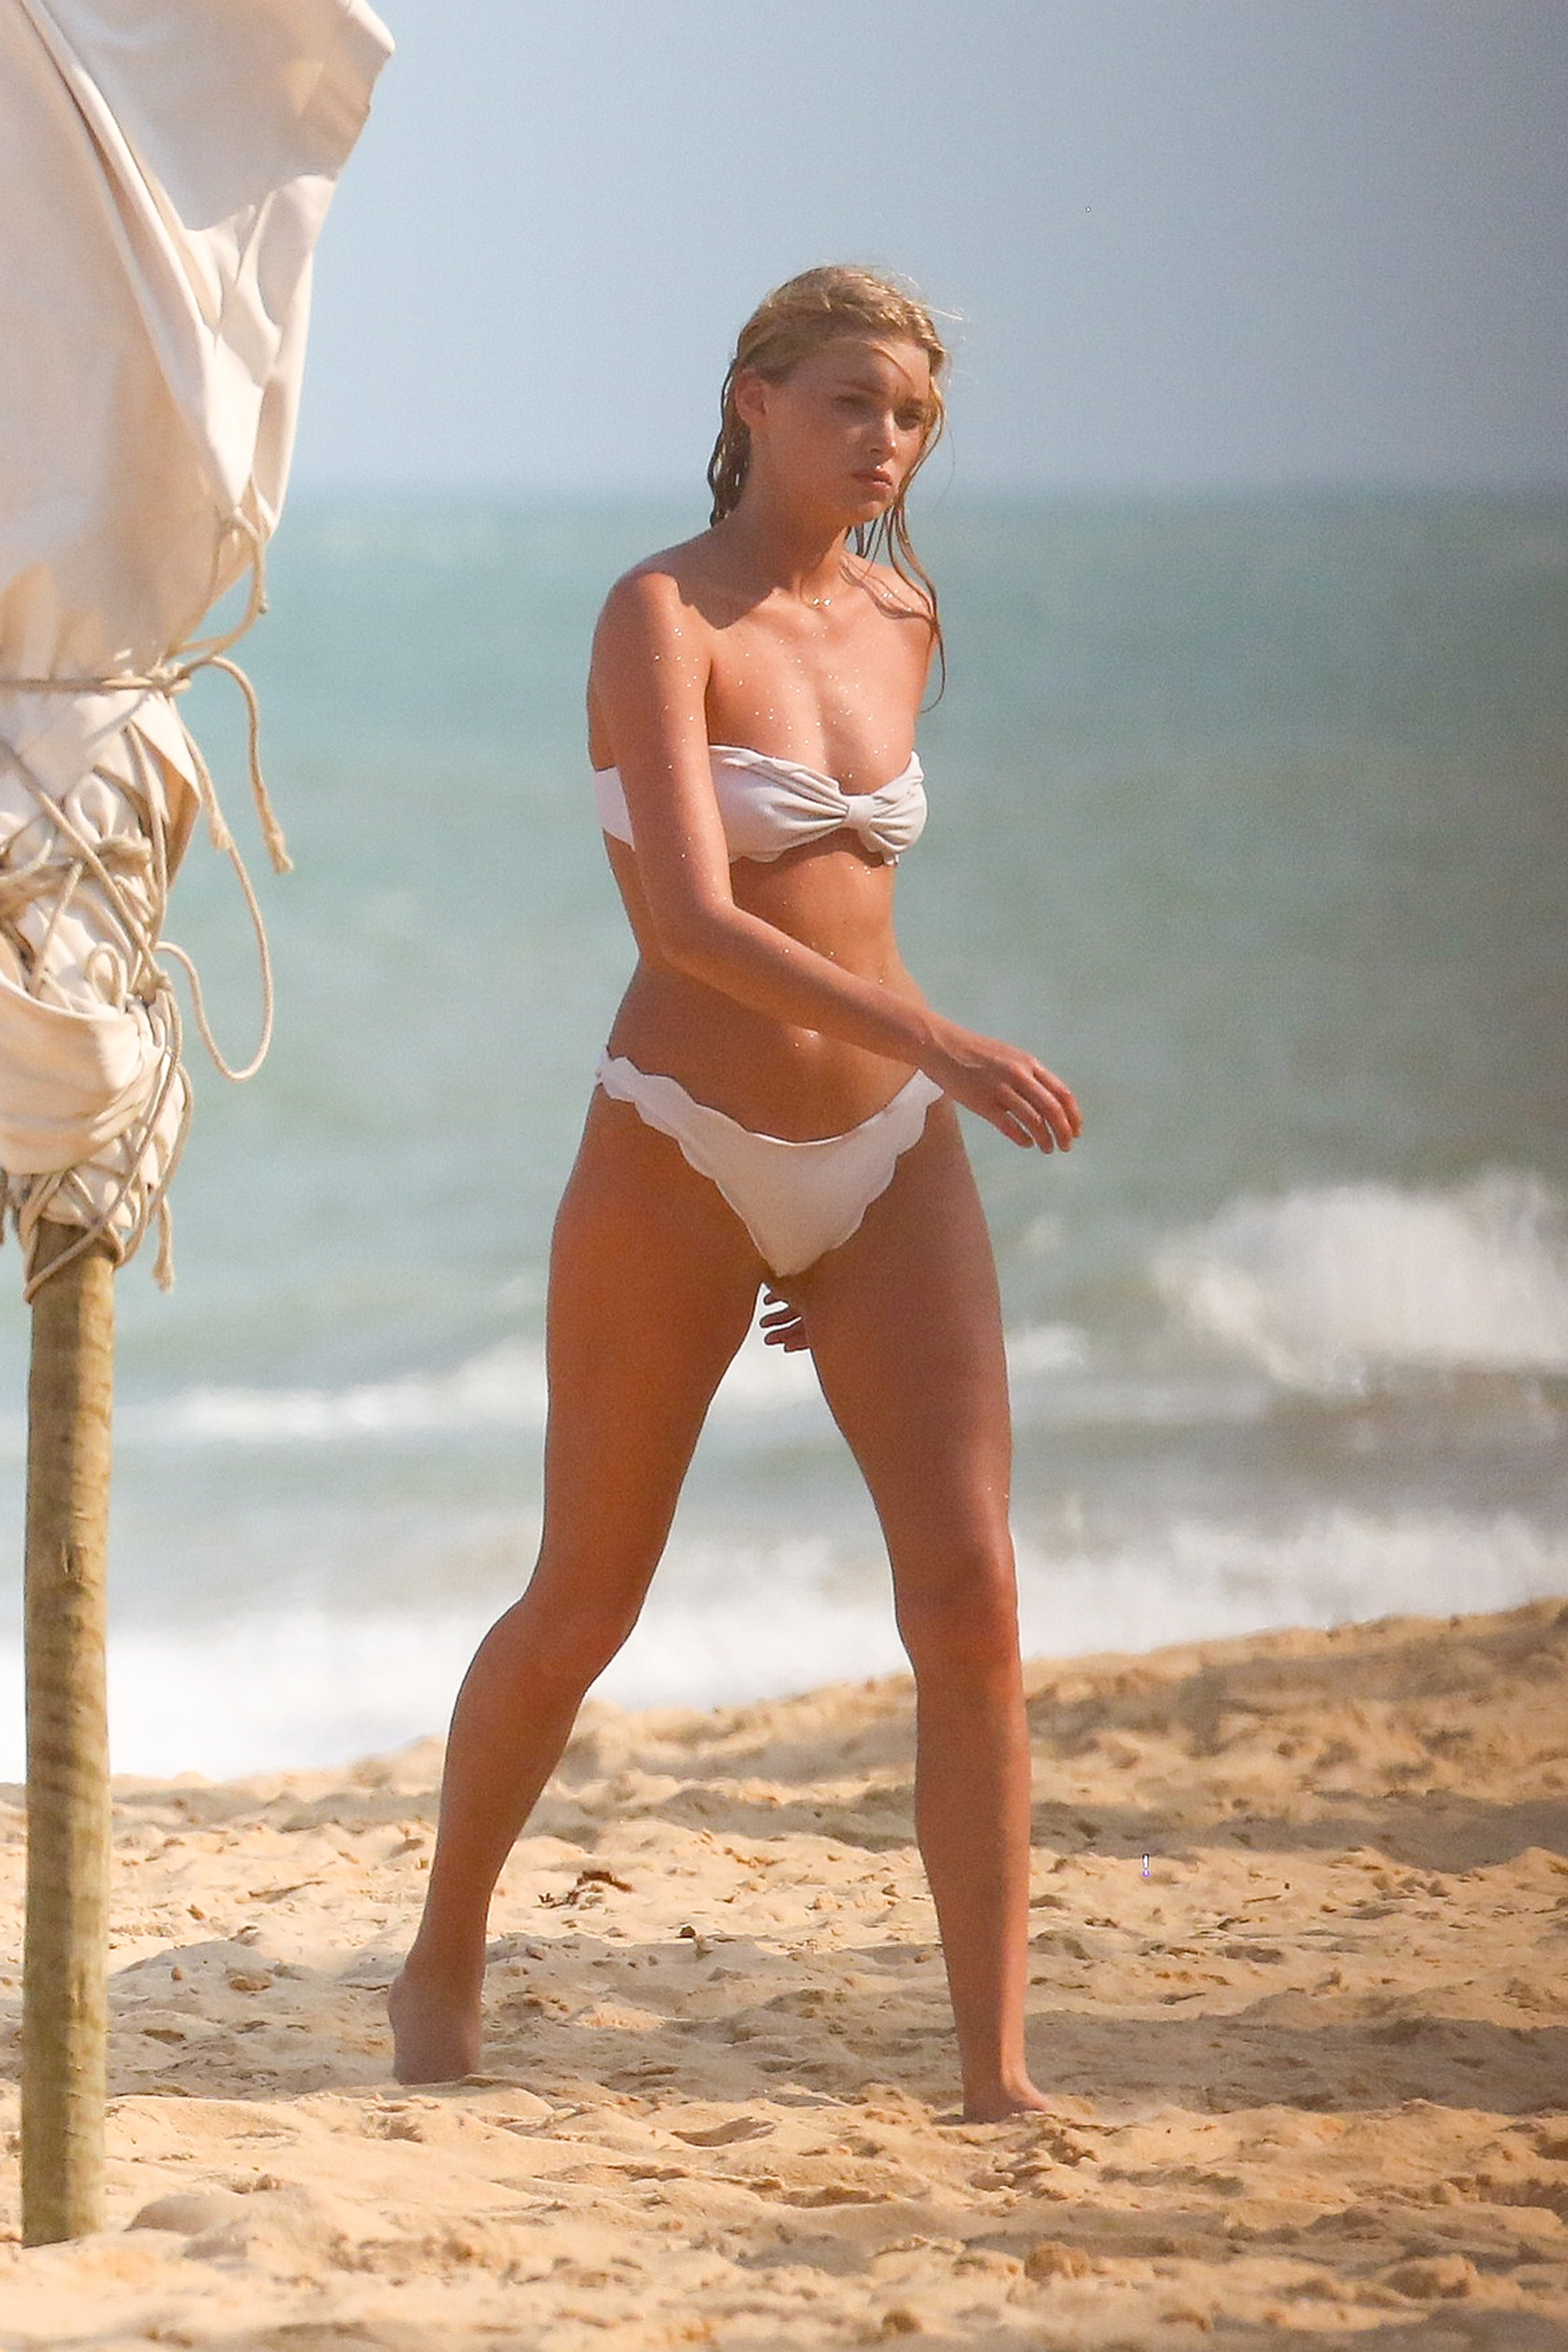 Bikini Pics Of Elsa Hosk